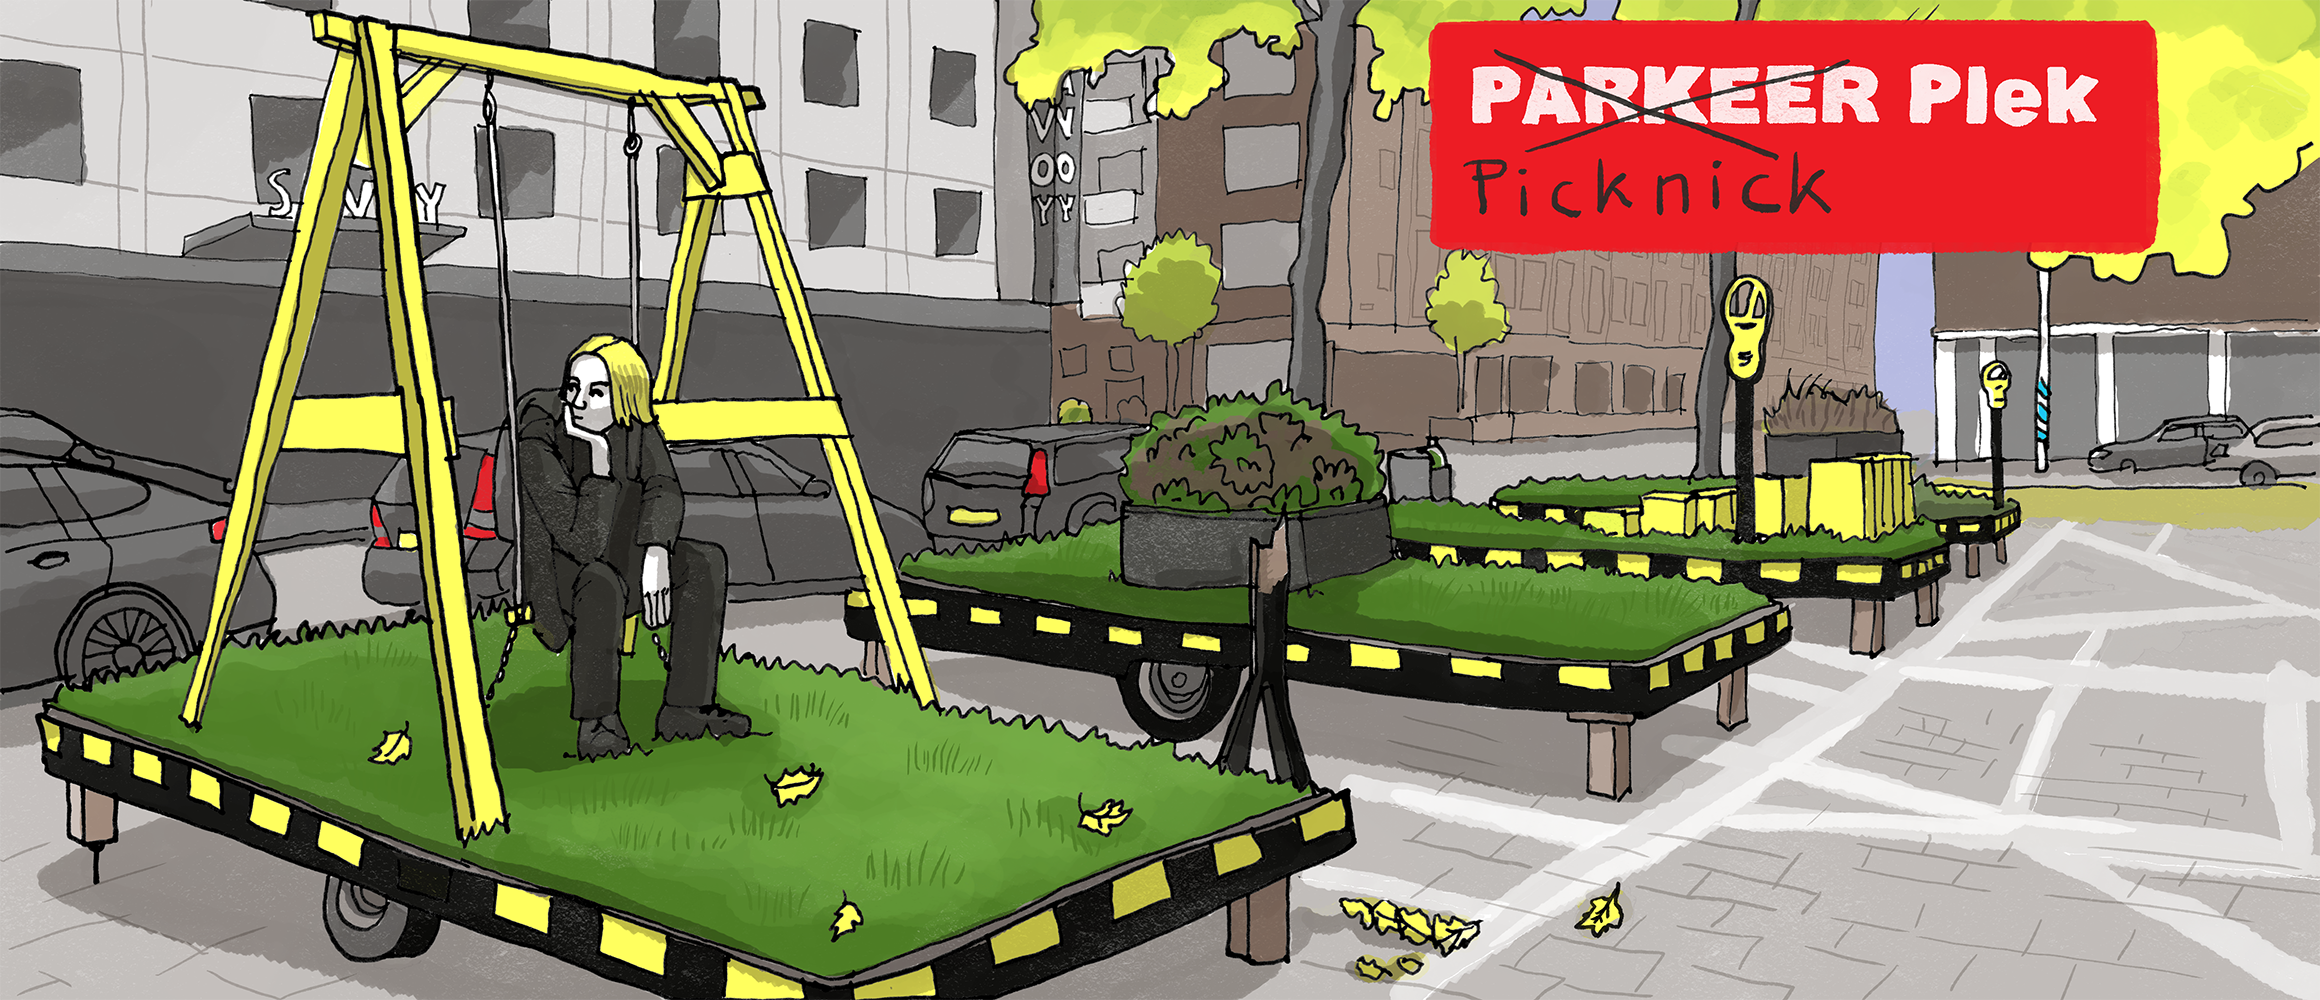 IkRotterdam_VersBeton_picknickplek